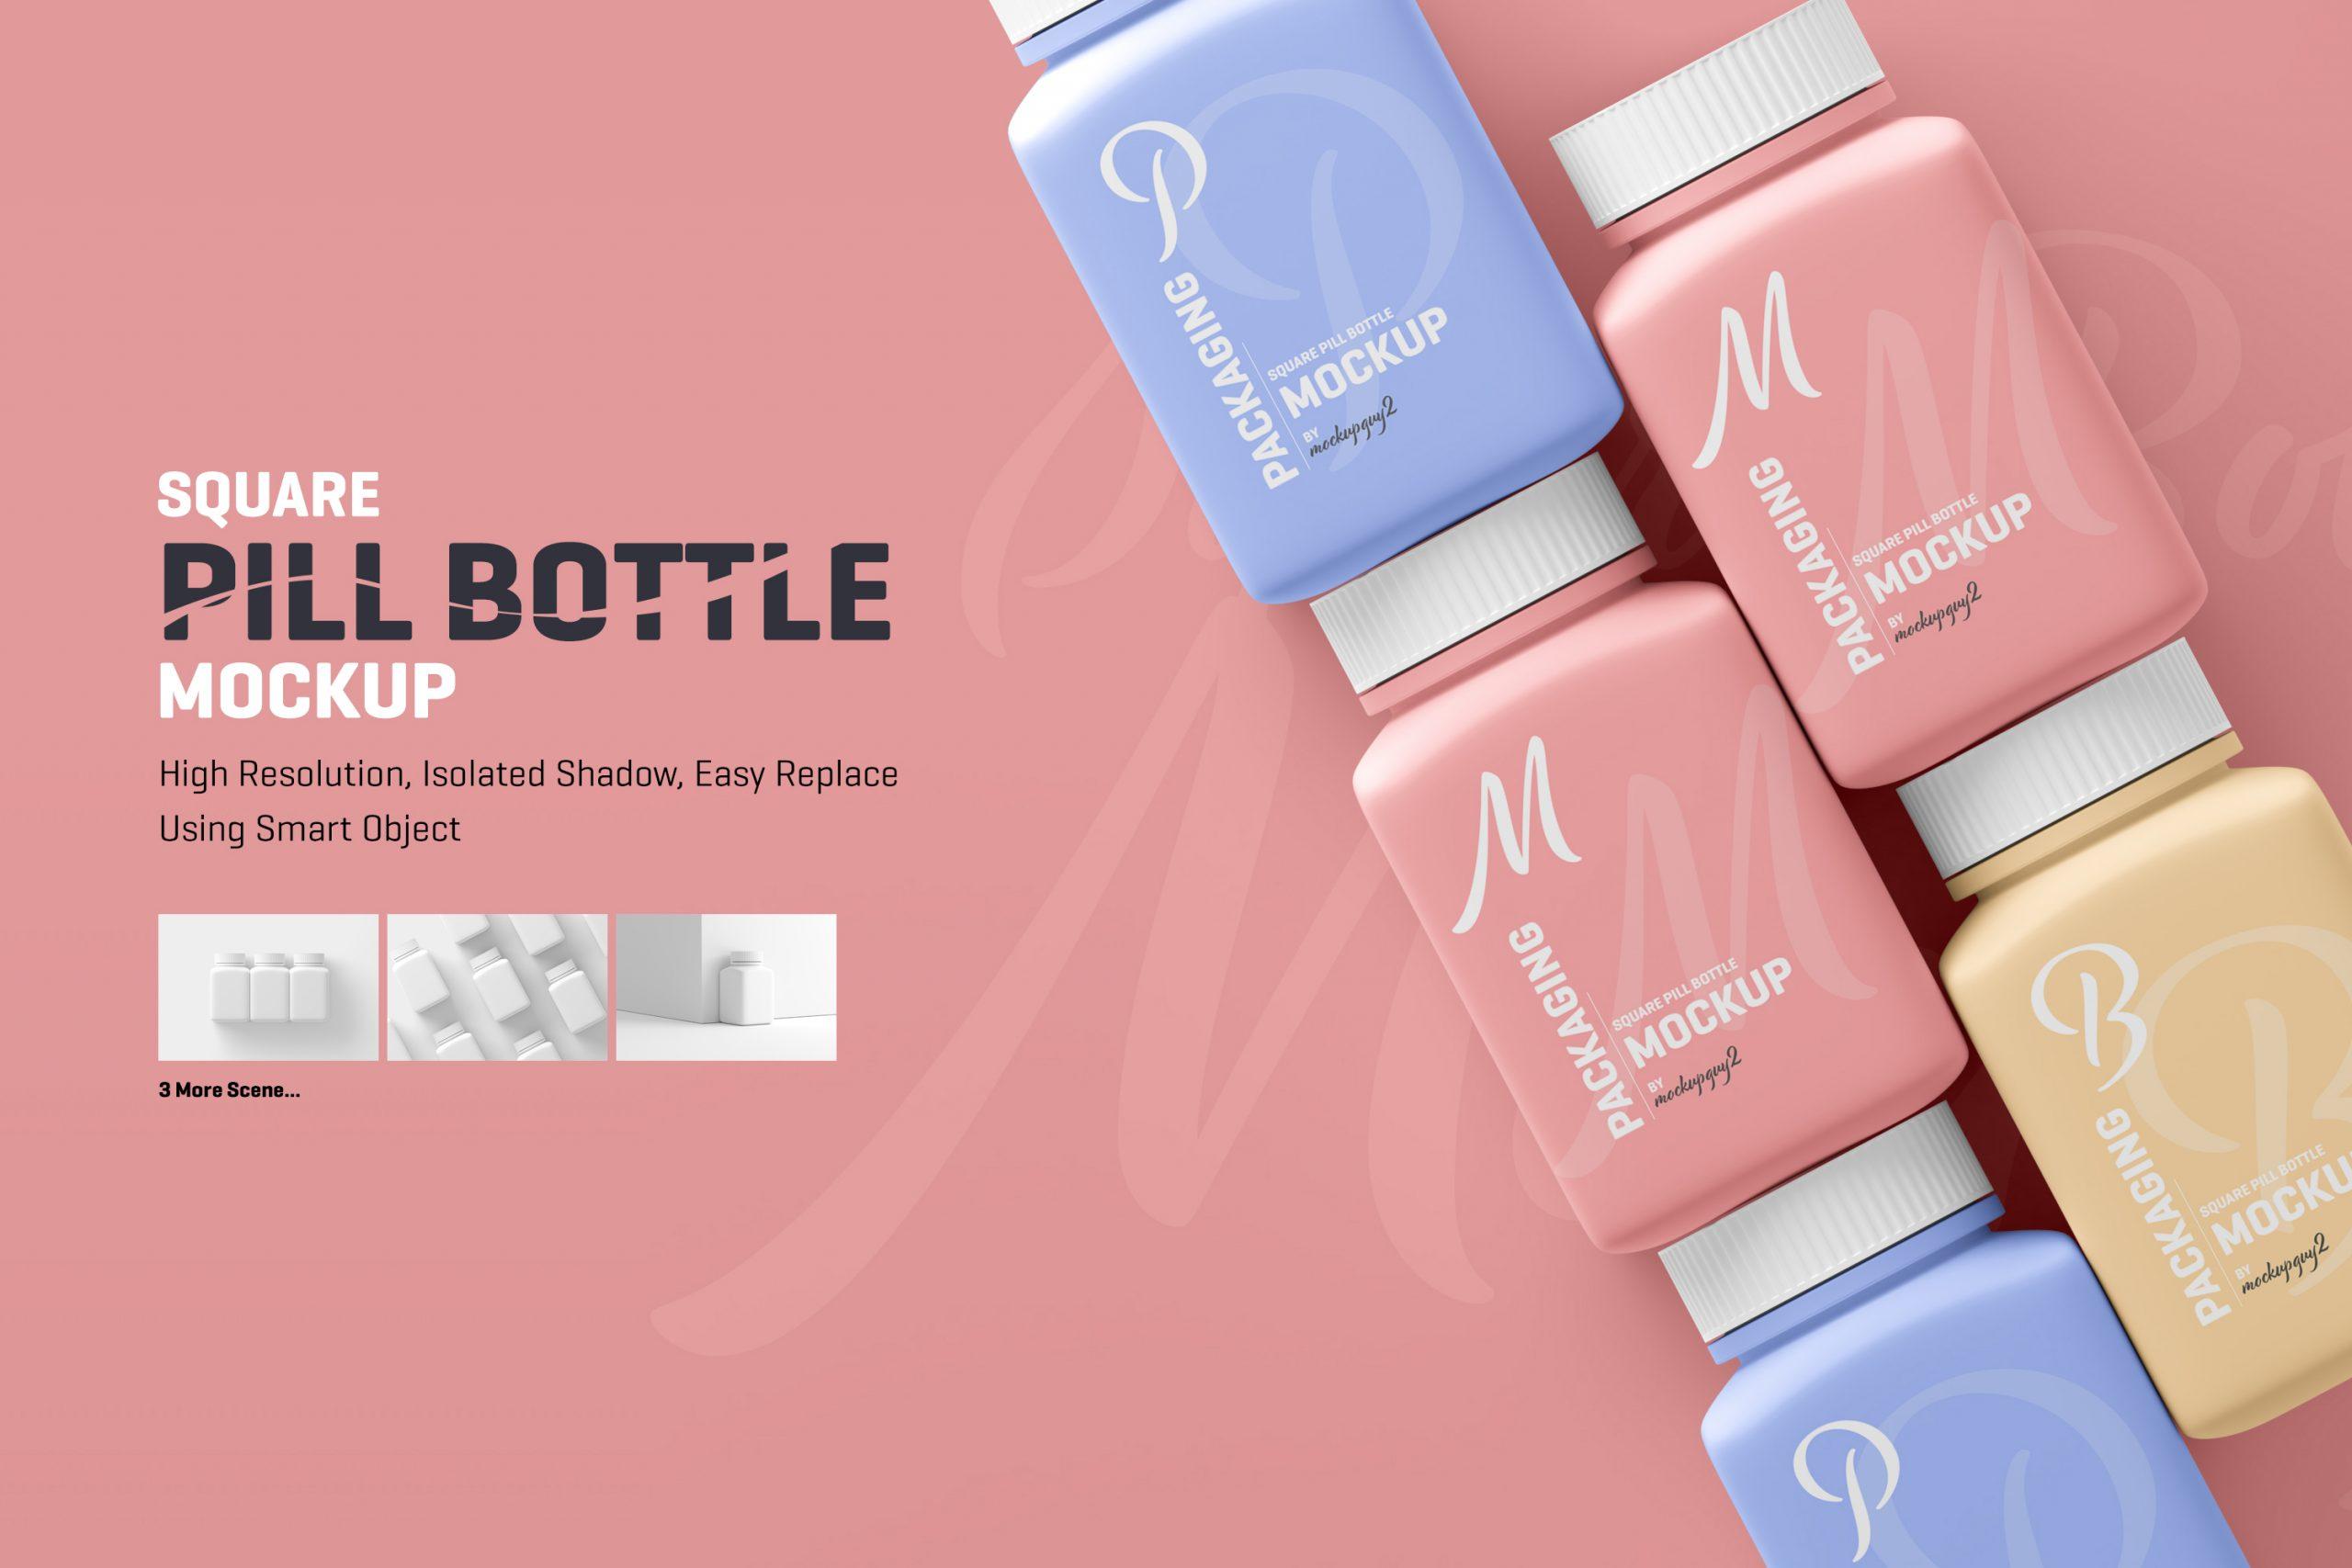 Square Pill Bottle Mockup